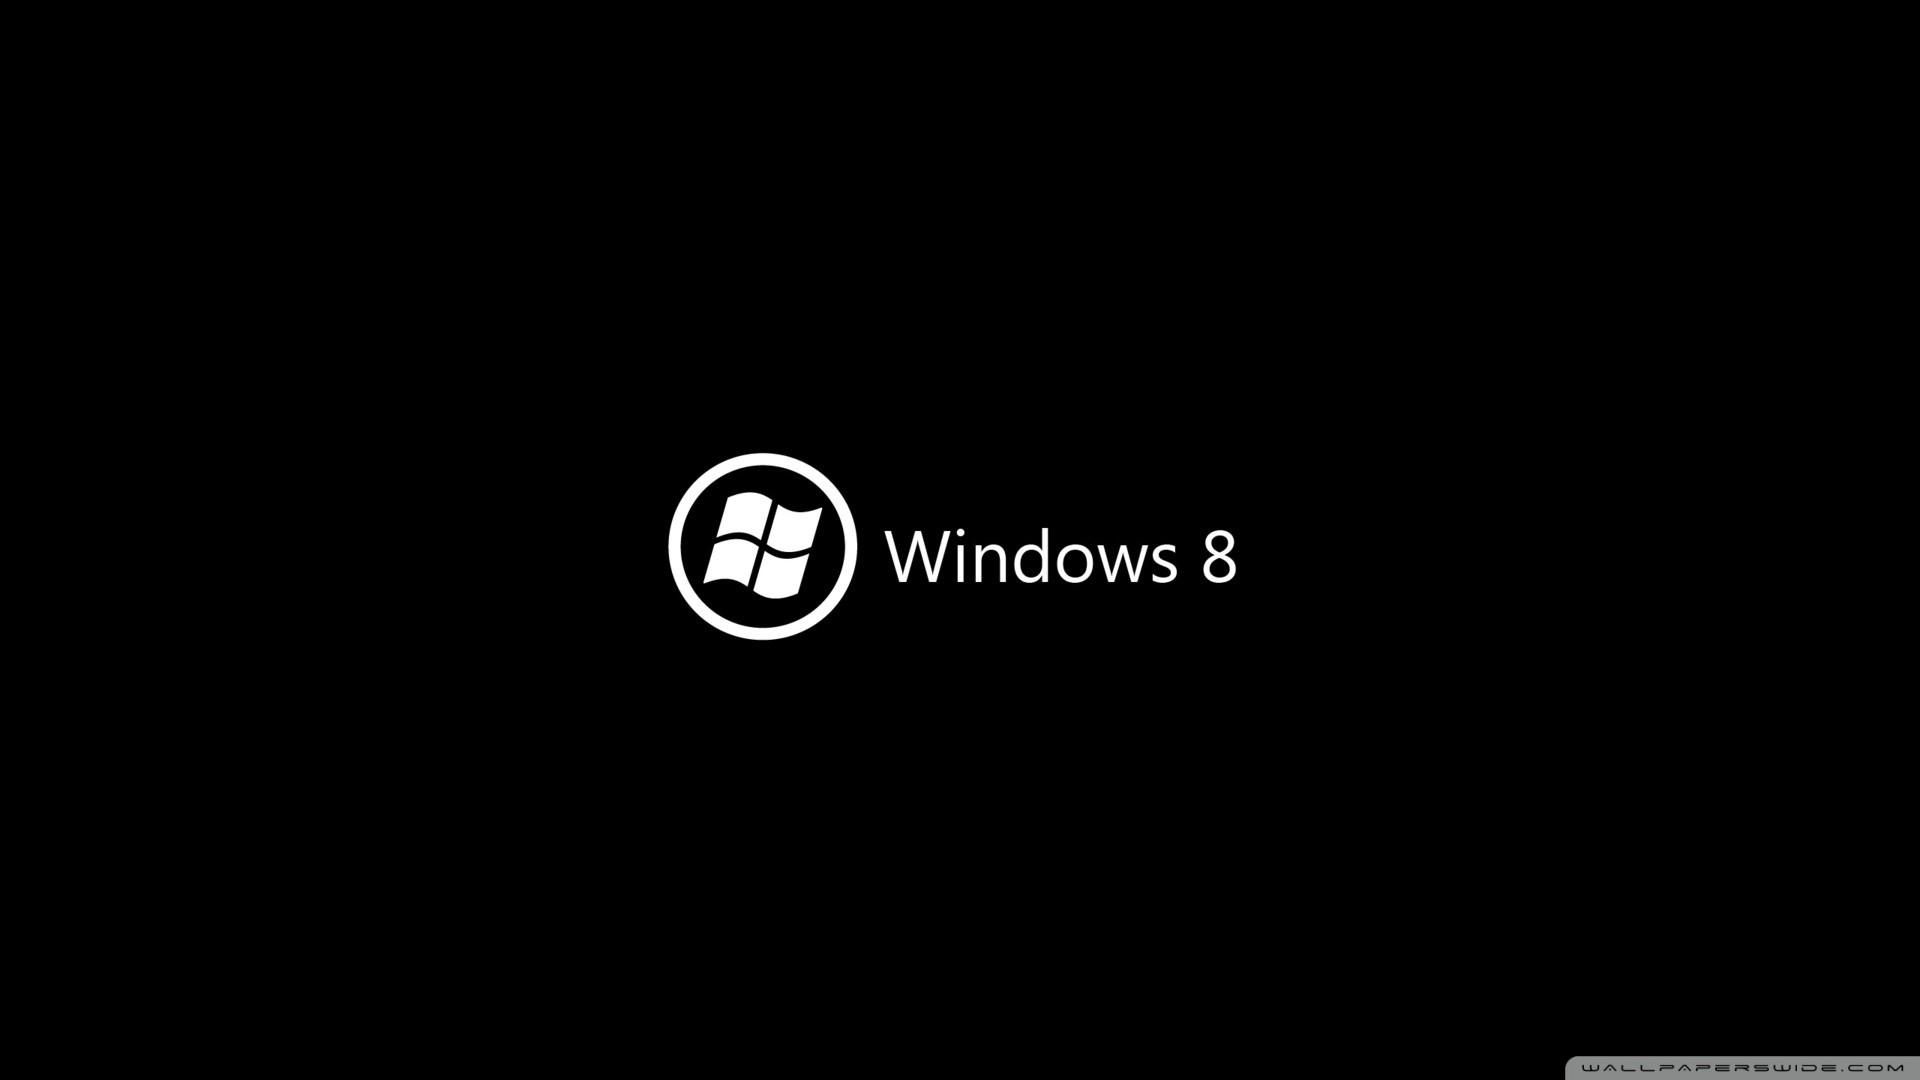 windows 8 wallpaper 1080p ·①